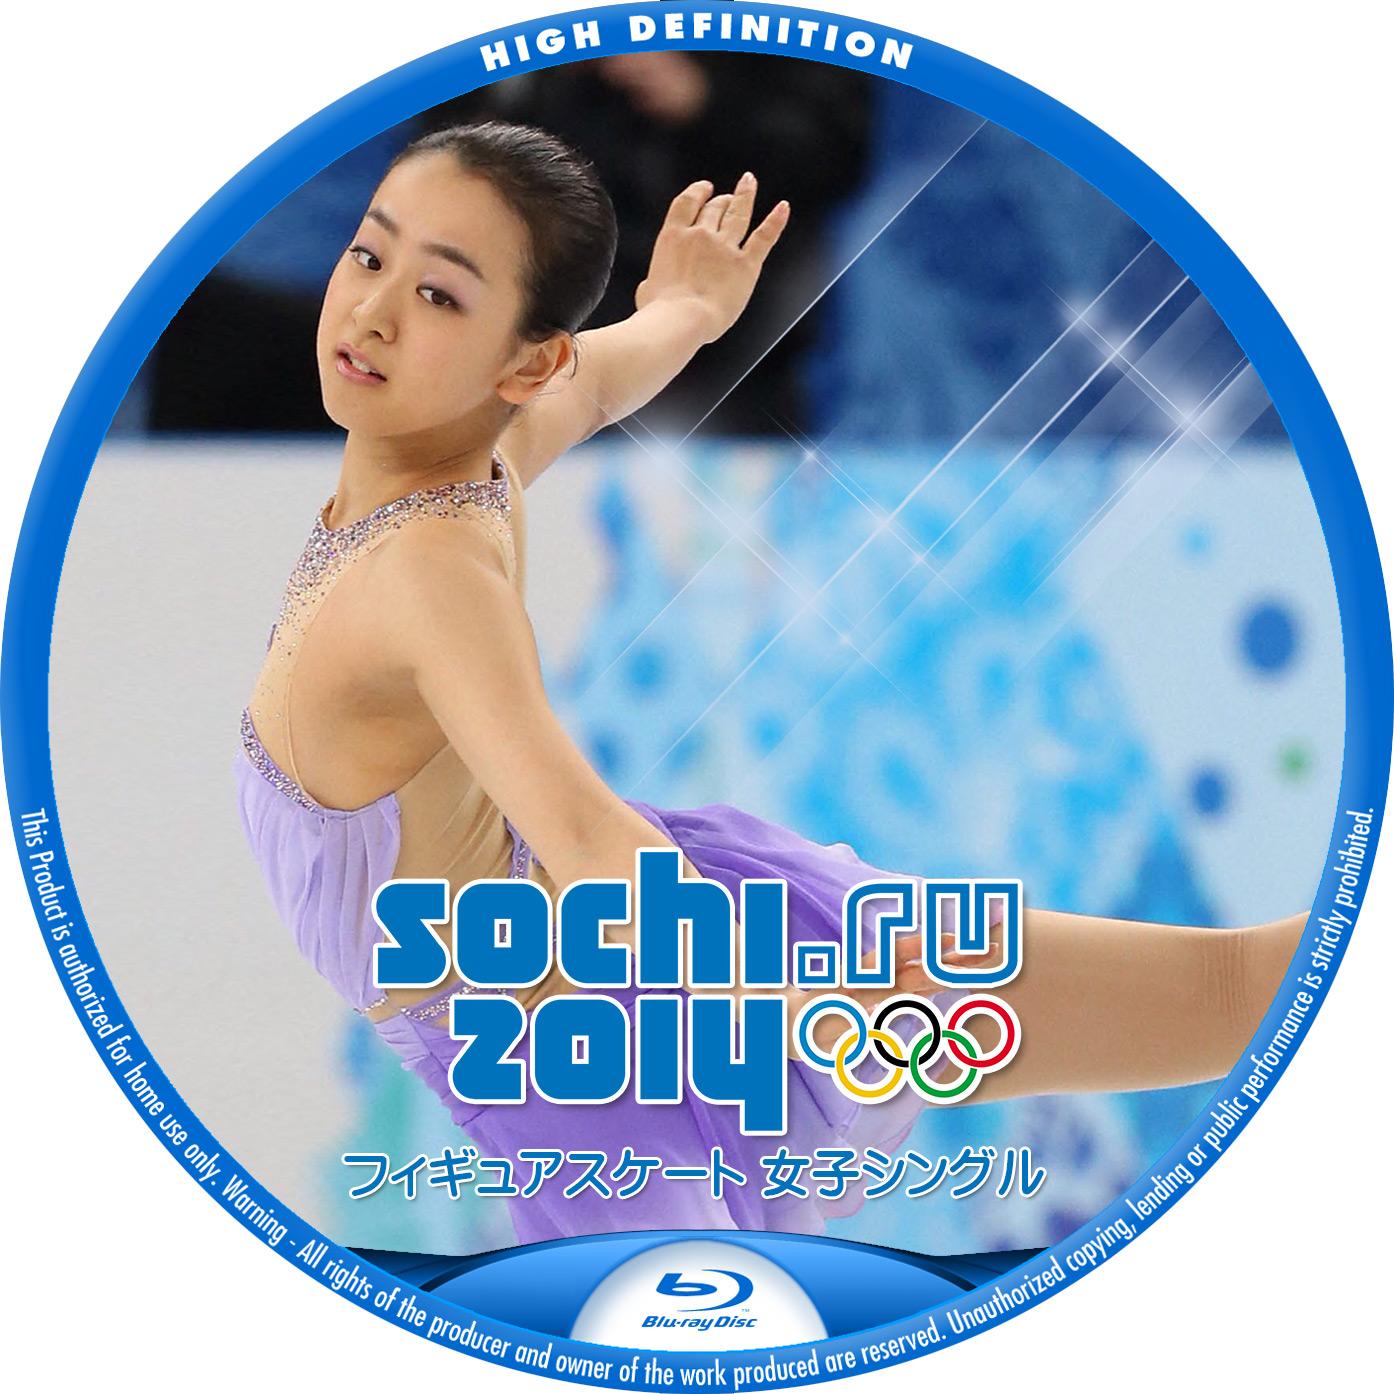 Sochi_Figure_Woens-BD3